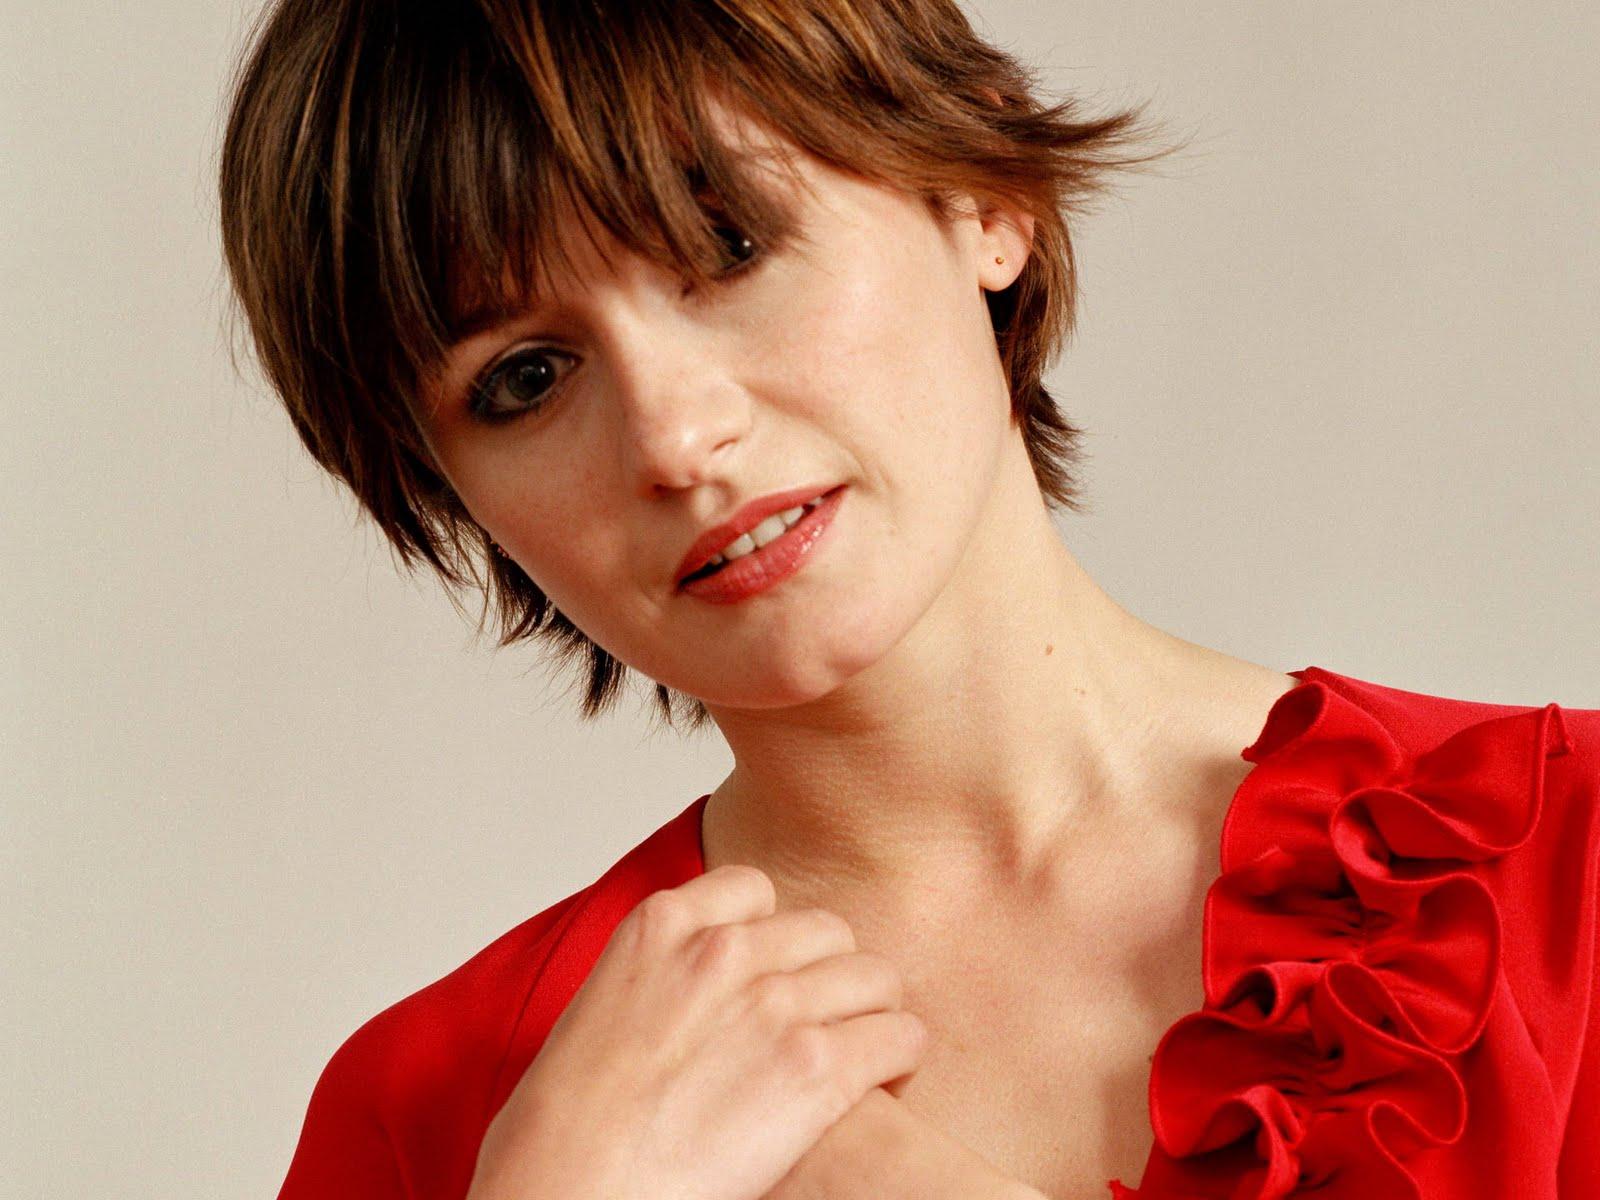 emily mortimer actress wallpaper 58898